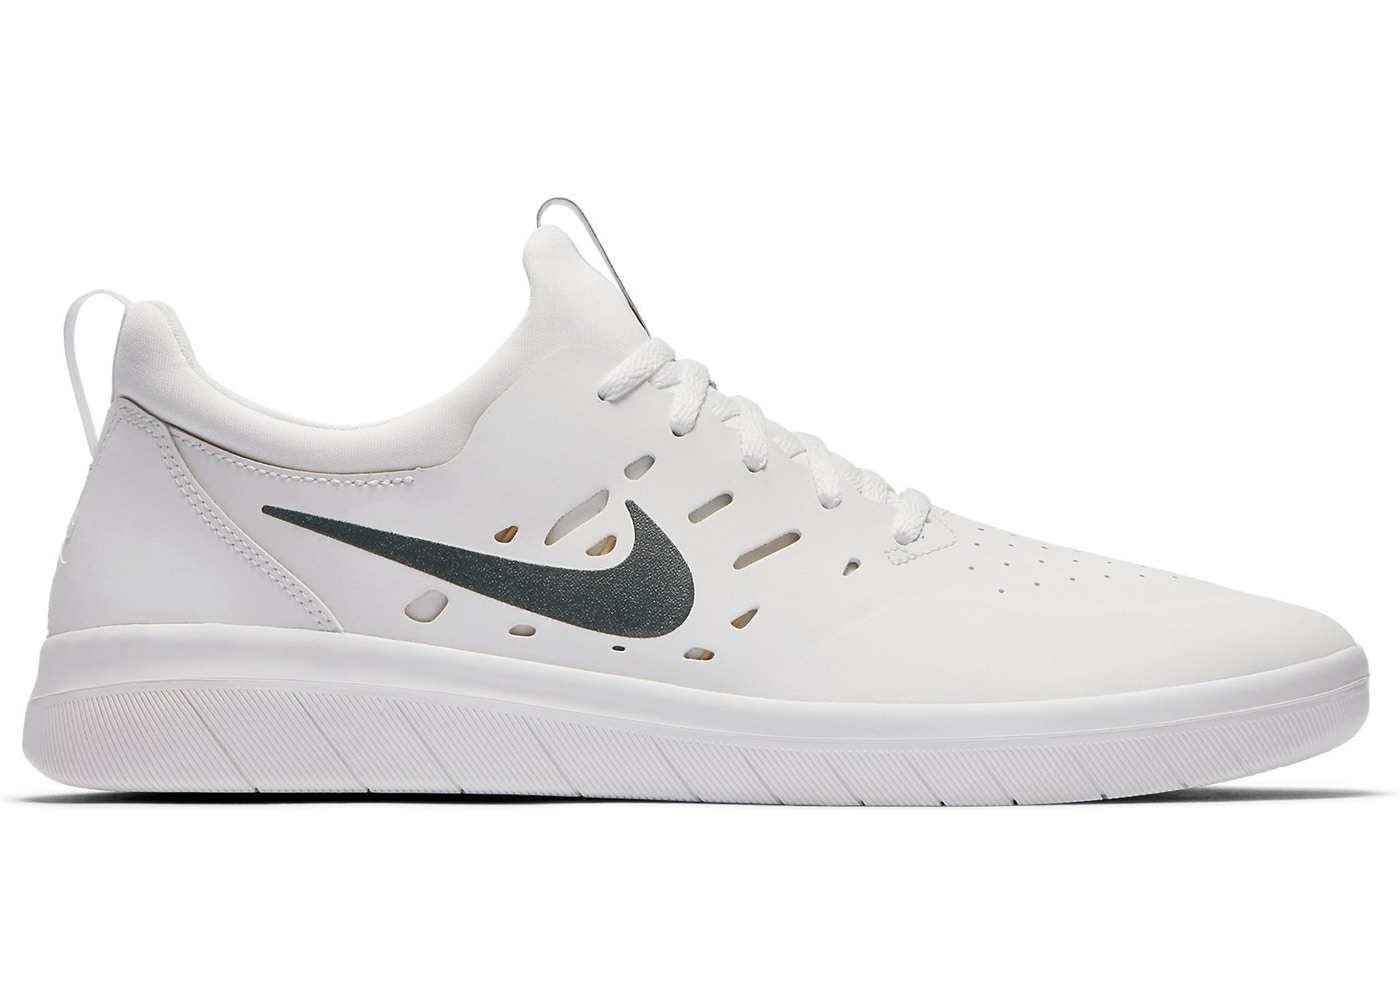 buy online 5ca63 4c7a1 Nike SB Nyjah White Anthracite